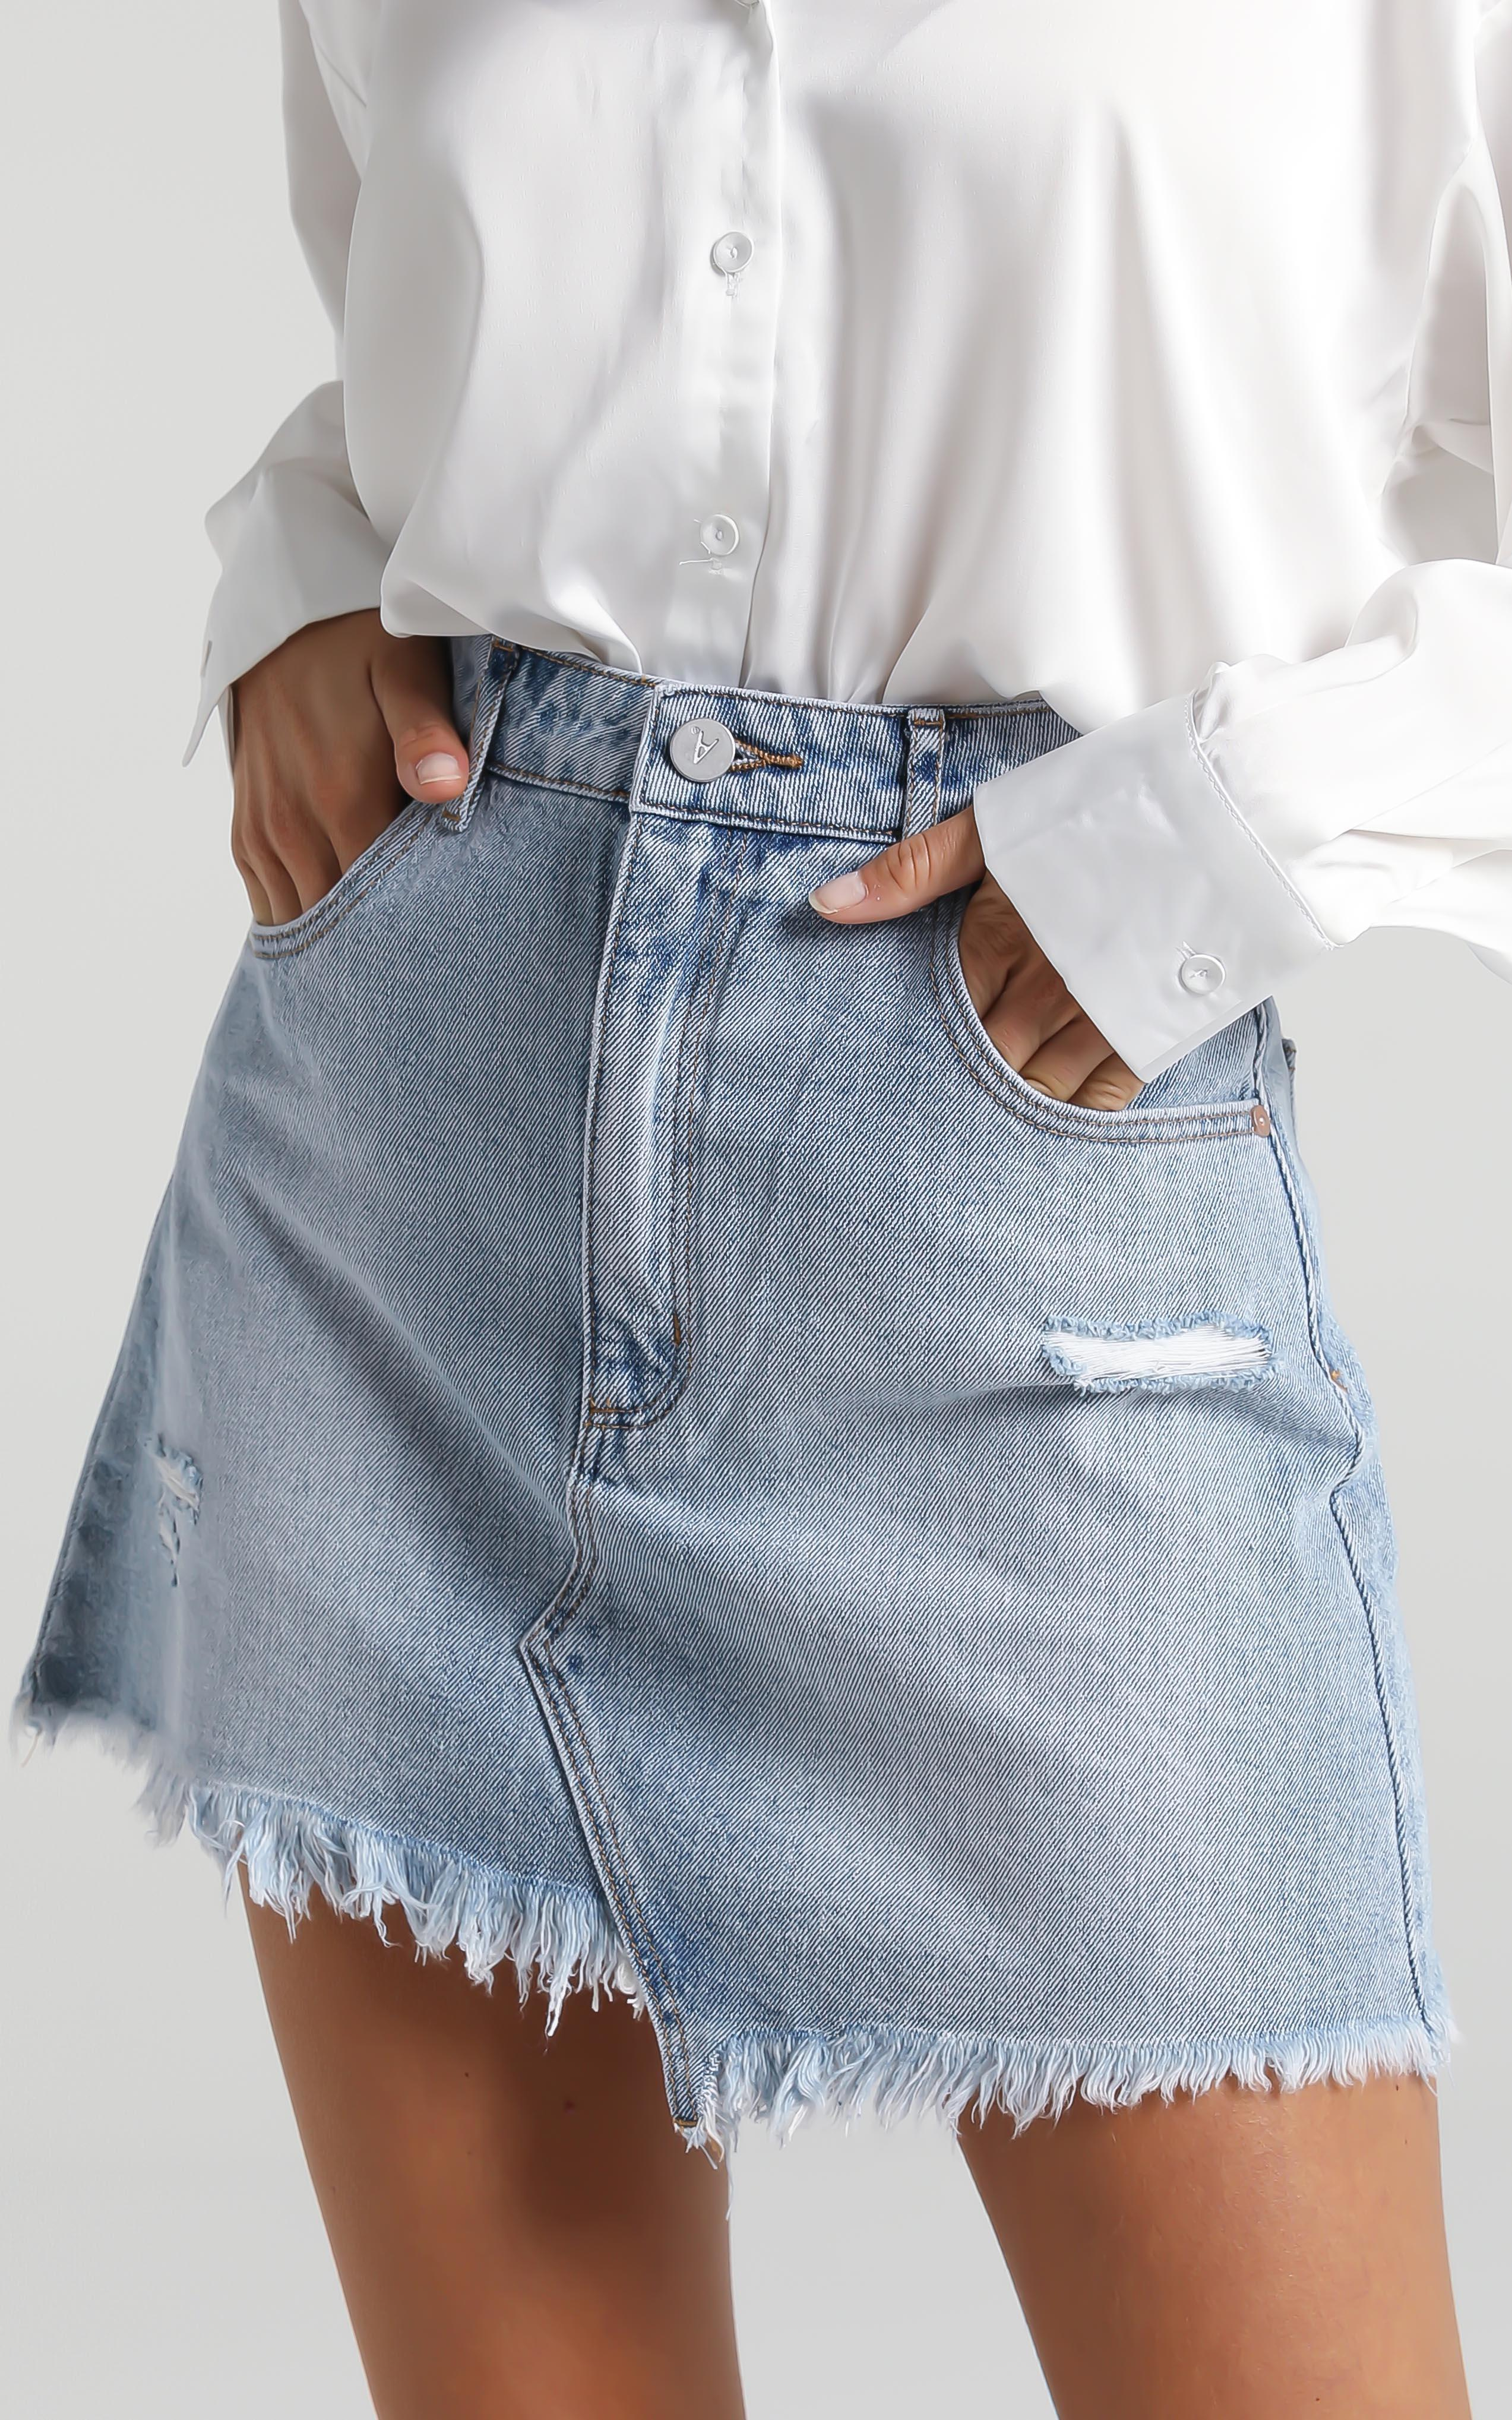 Abrand - A Aline Denim Skirt in Nancy - 6 (XS), BLU12, hi-res image number null